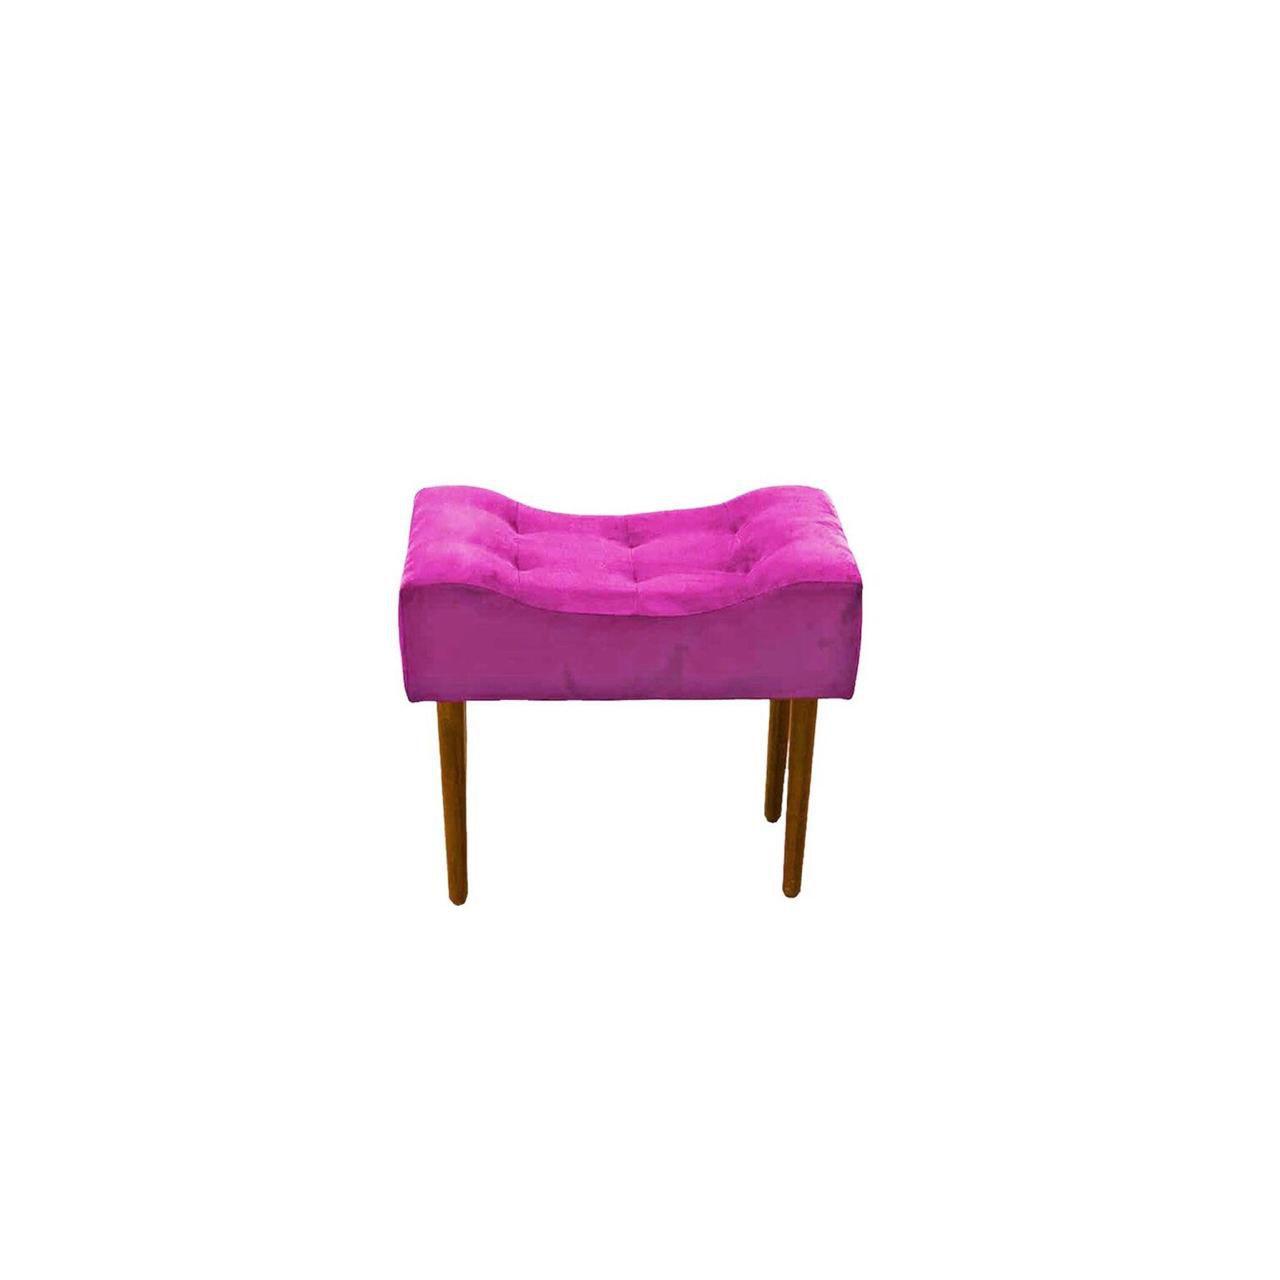 Kit Poltrona Decorativa Nina com rodapé e Puff retangular Rosa